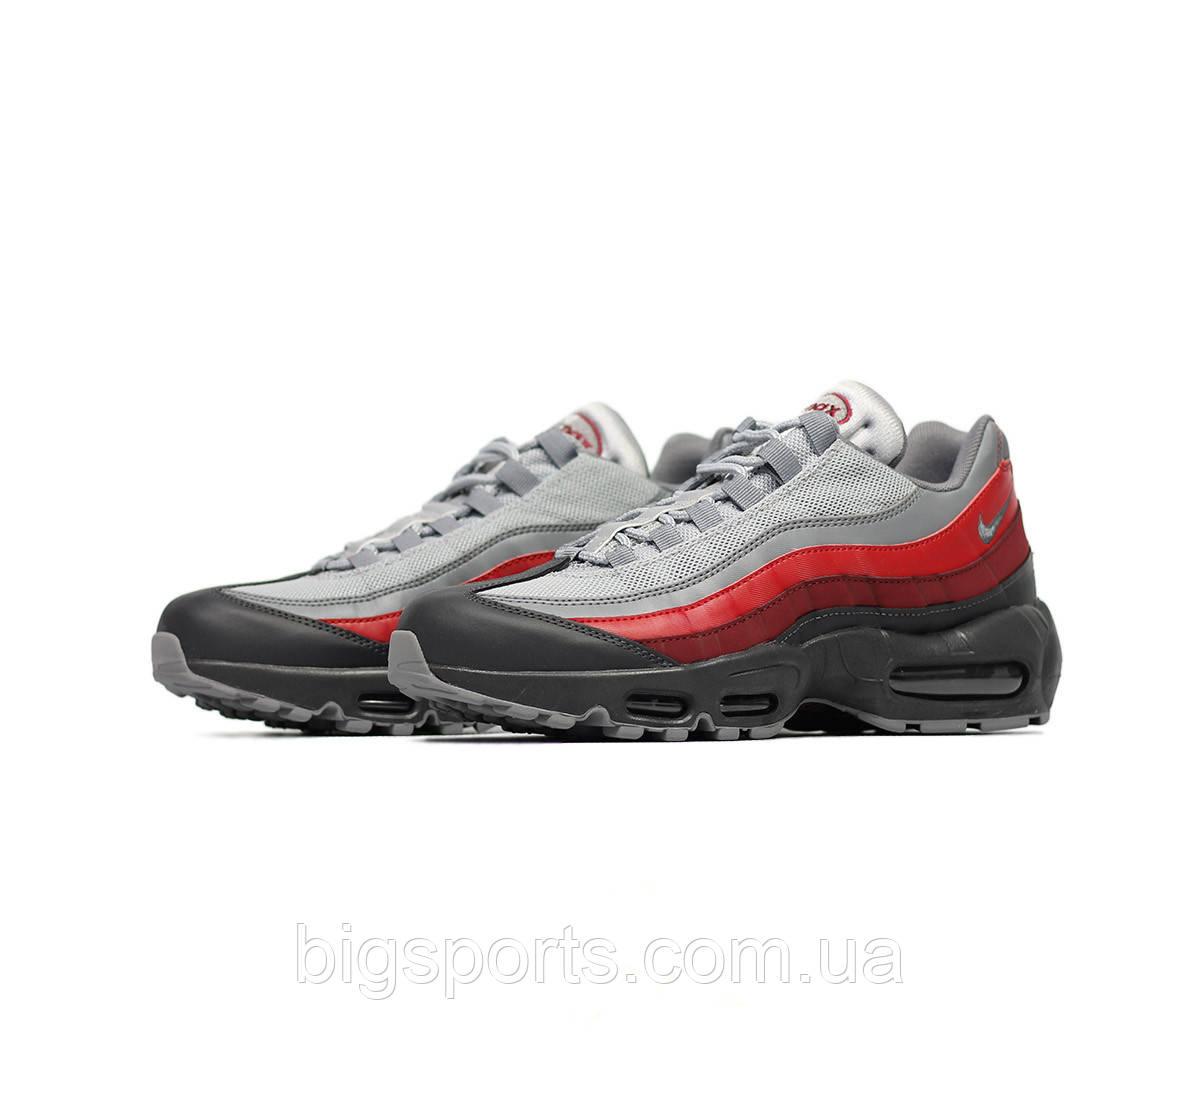 Кроссовки муж. Nike Air Max 95 Essential (арт. 749766-025)